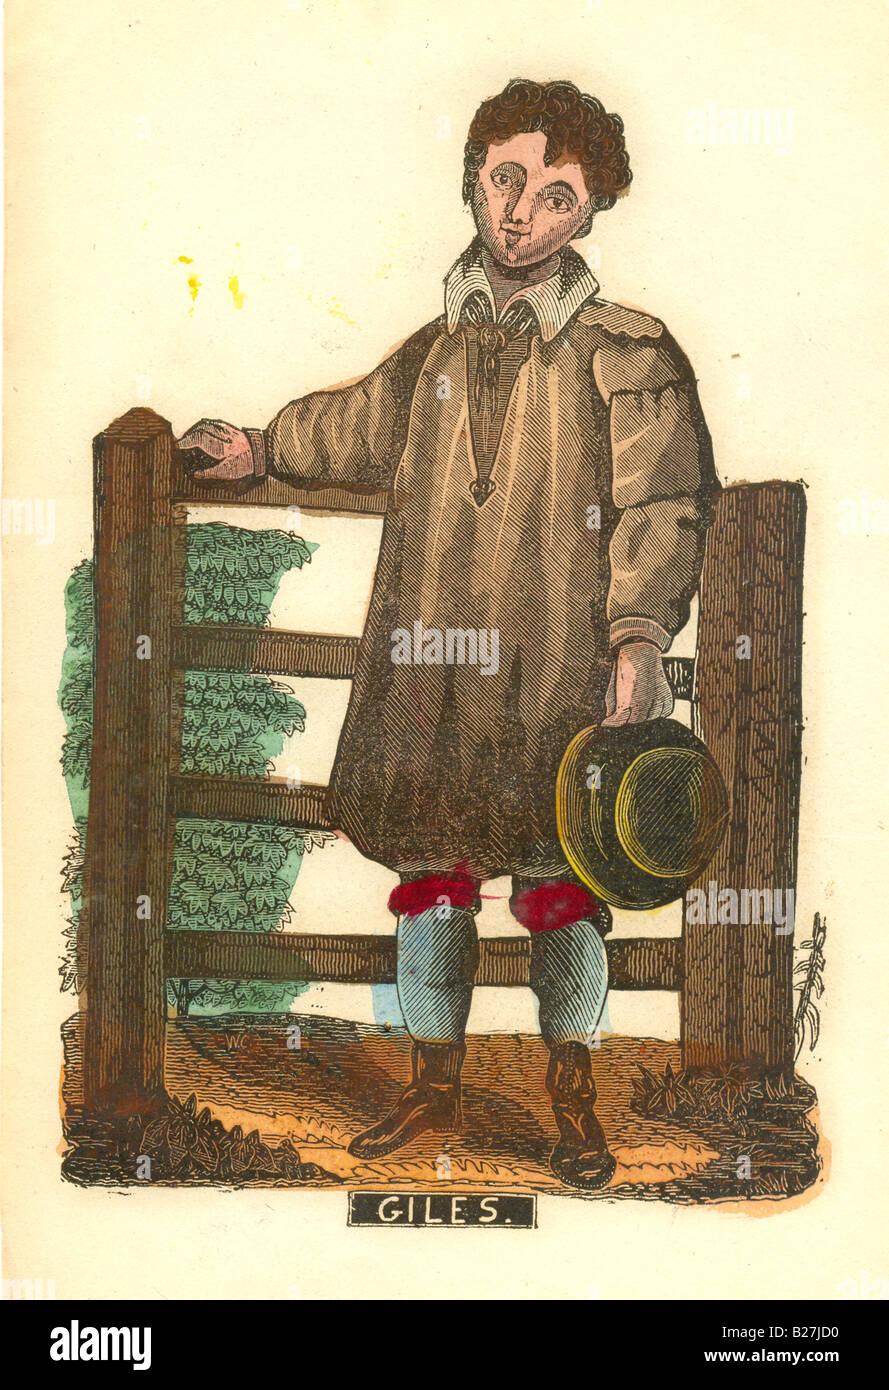 Handcoloured woodcut of farm boy titled 'Giles' circa 1840 - Stock Image